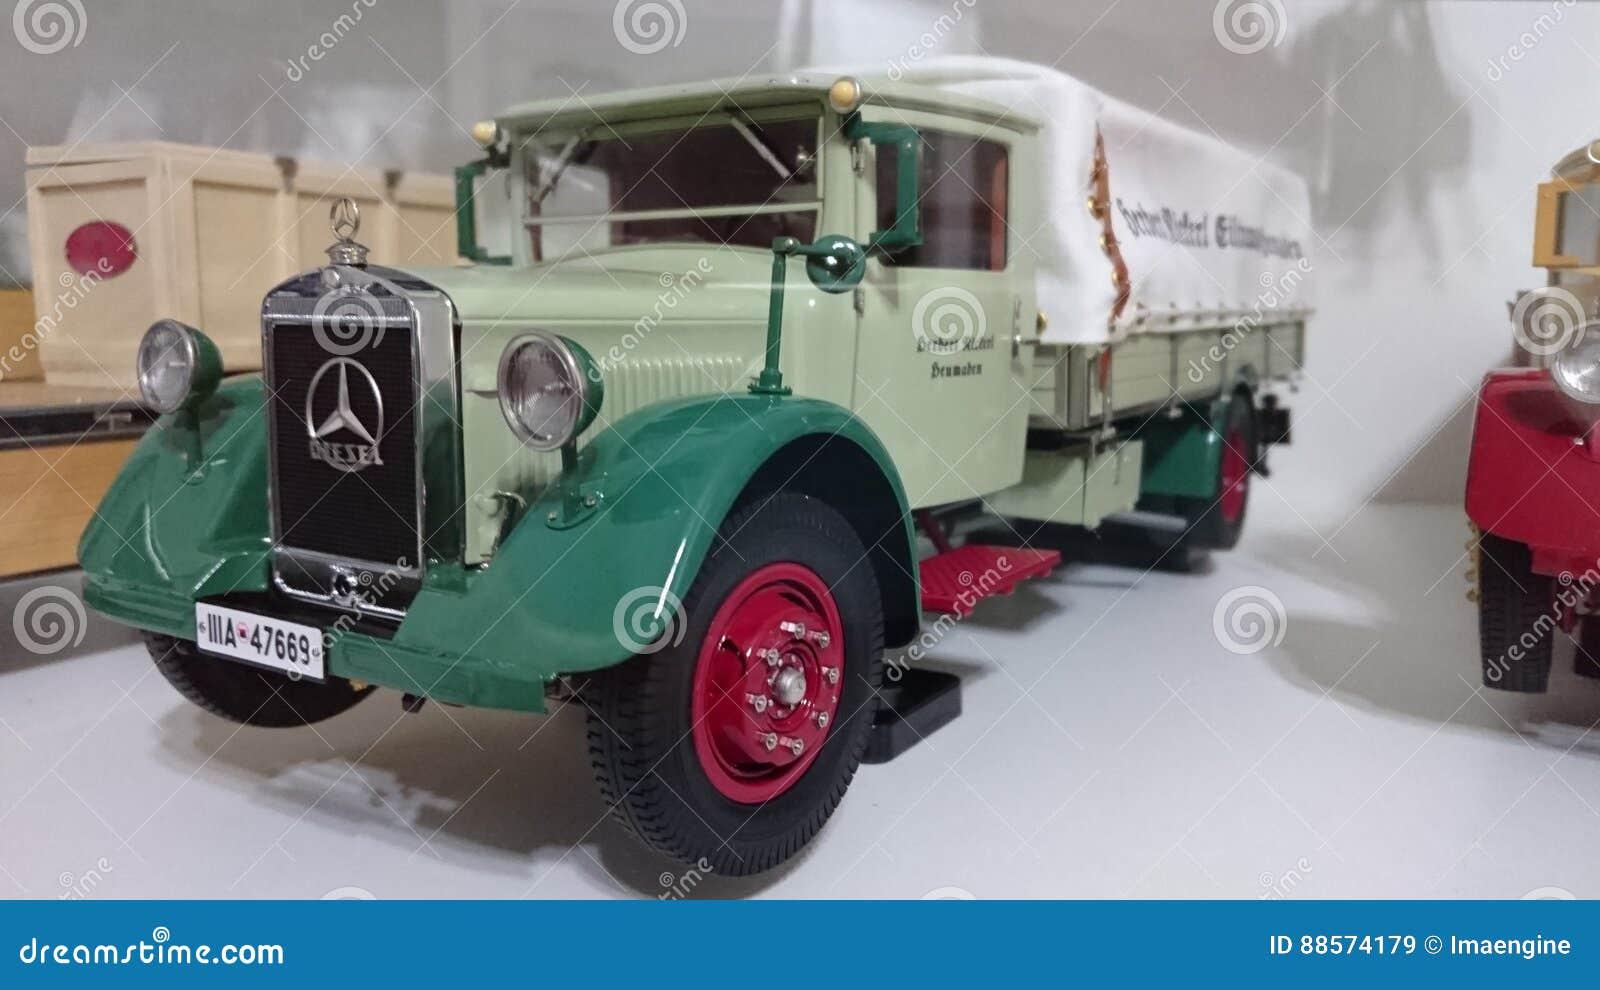 Mercedes Benz Lo2750 Transporter Scale Model Car Editorial Stock